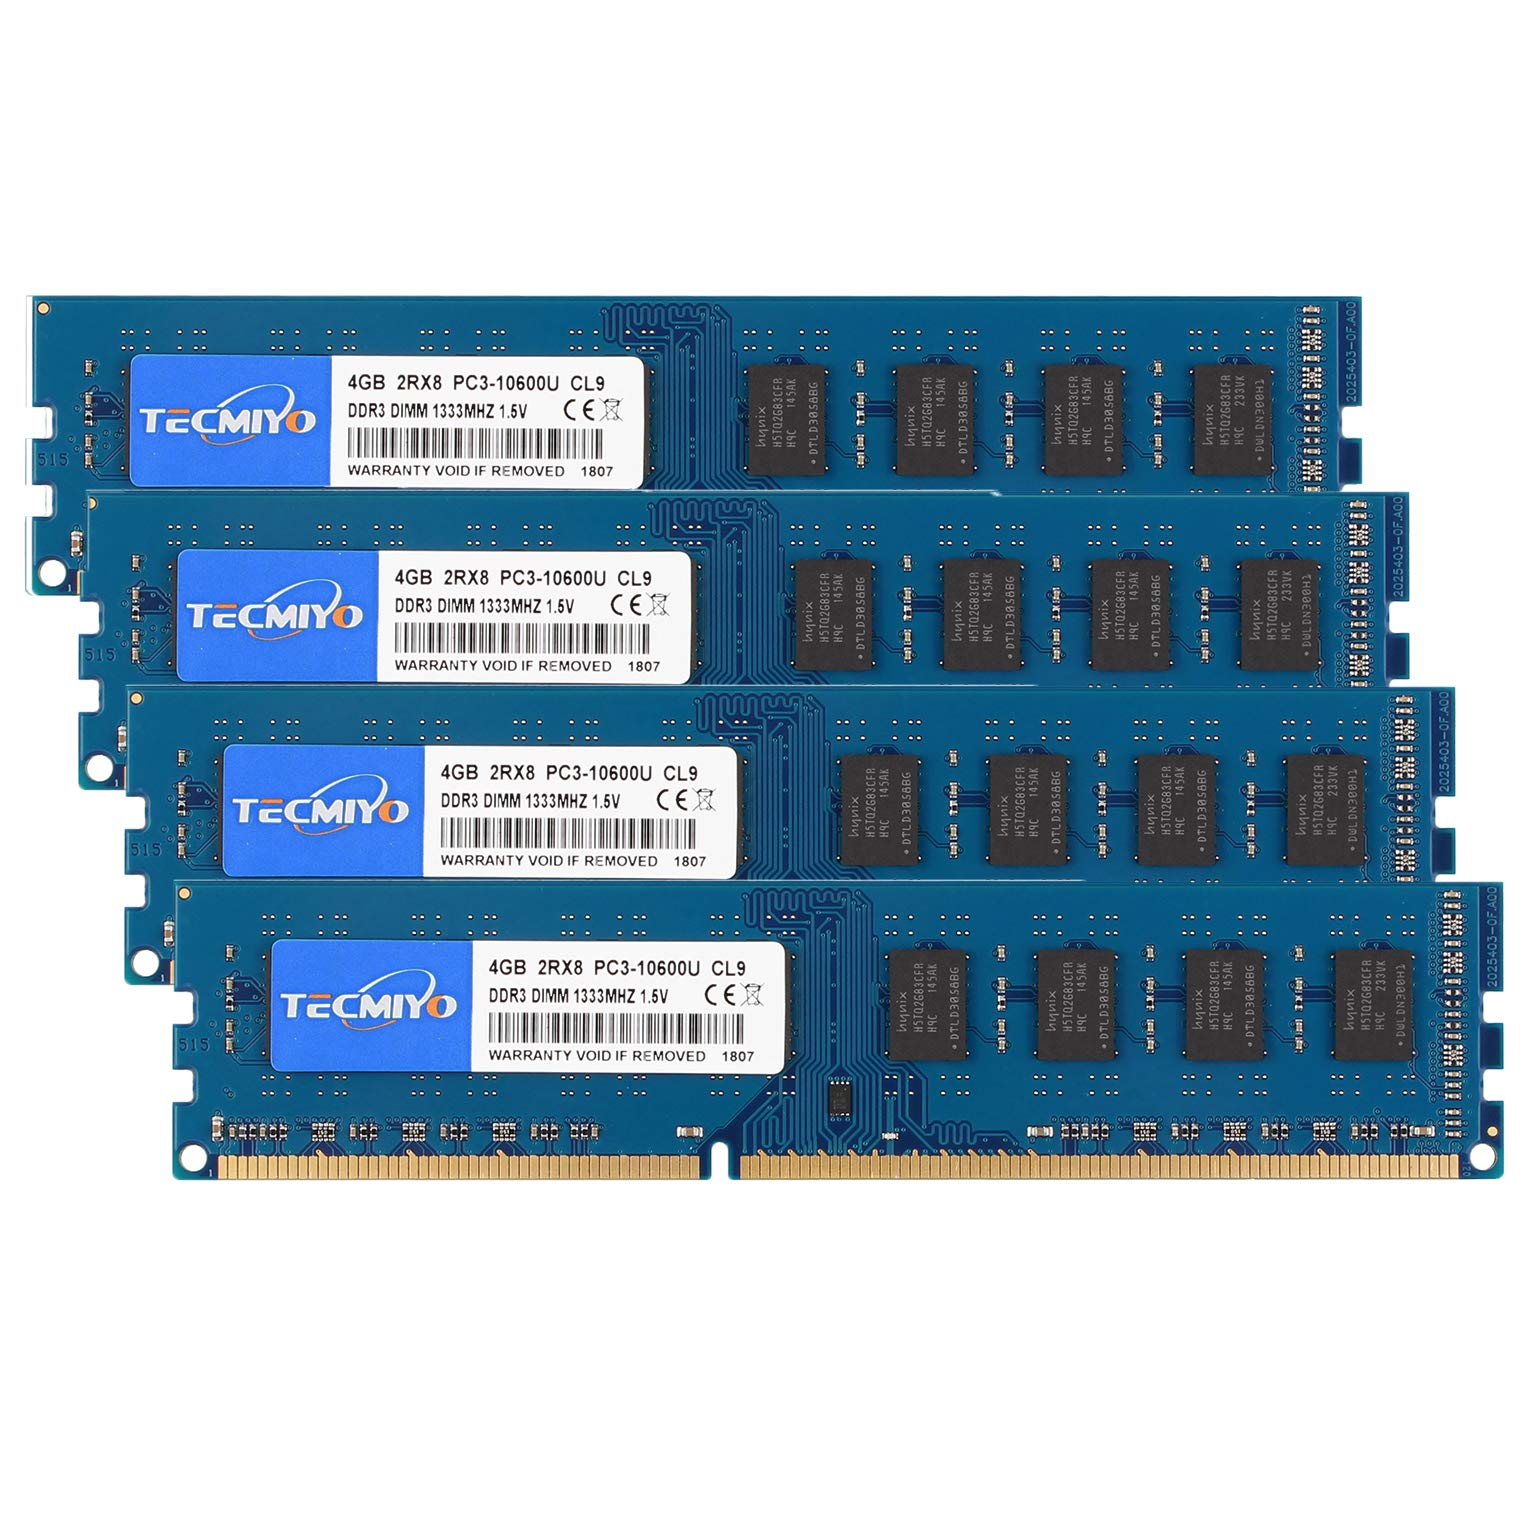 Memoria RAM 16GB TECMIYO Kit (4x4GB) DDR3 1333MHz PC3-10600 PC3-10600U Non ECC Unbuffered 1.5V CL9 2RX8 Dual Rank 240 Pi